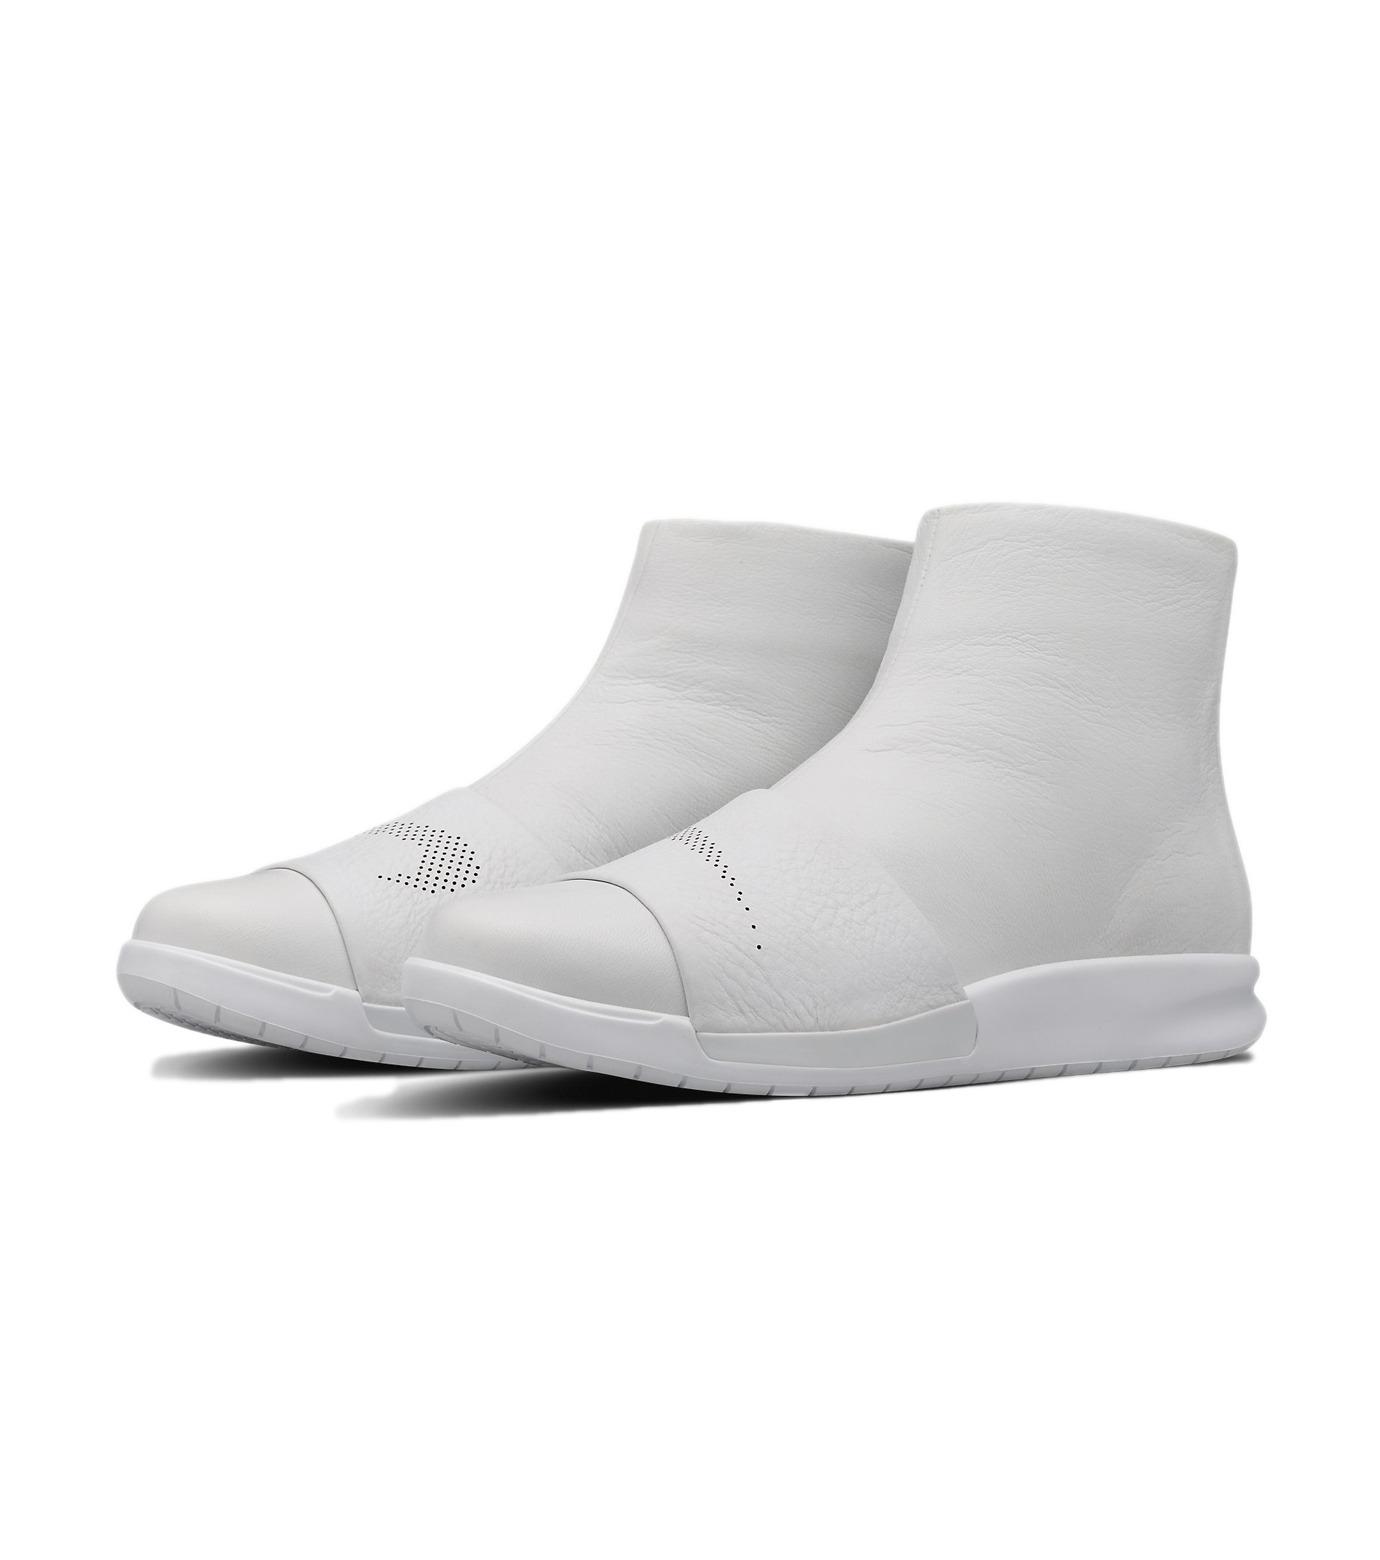 NIKE(ナイキ)のBenassi SI-WHITE(シューズ/shoes)-819683-100-4 拡大詳細画像3